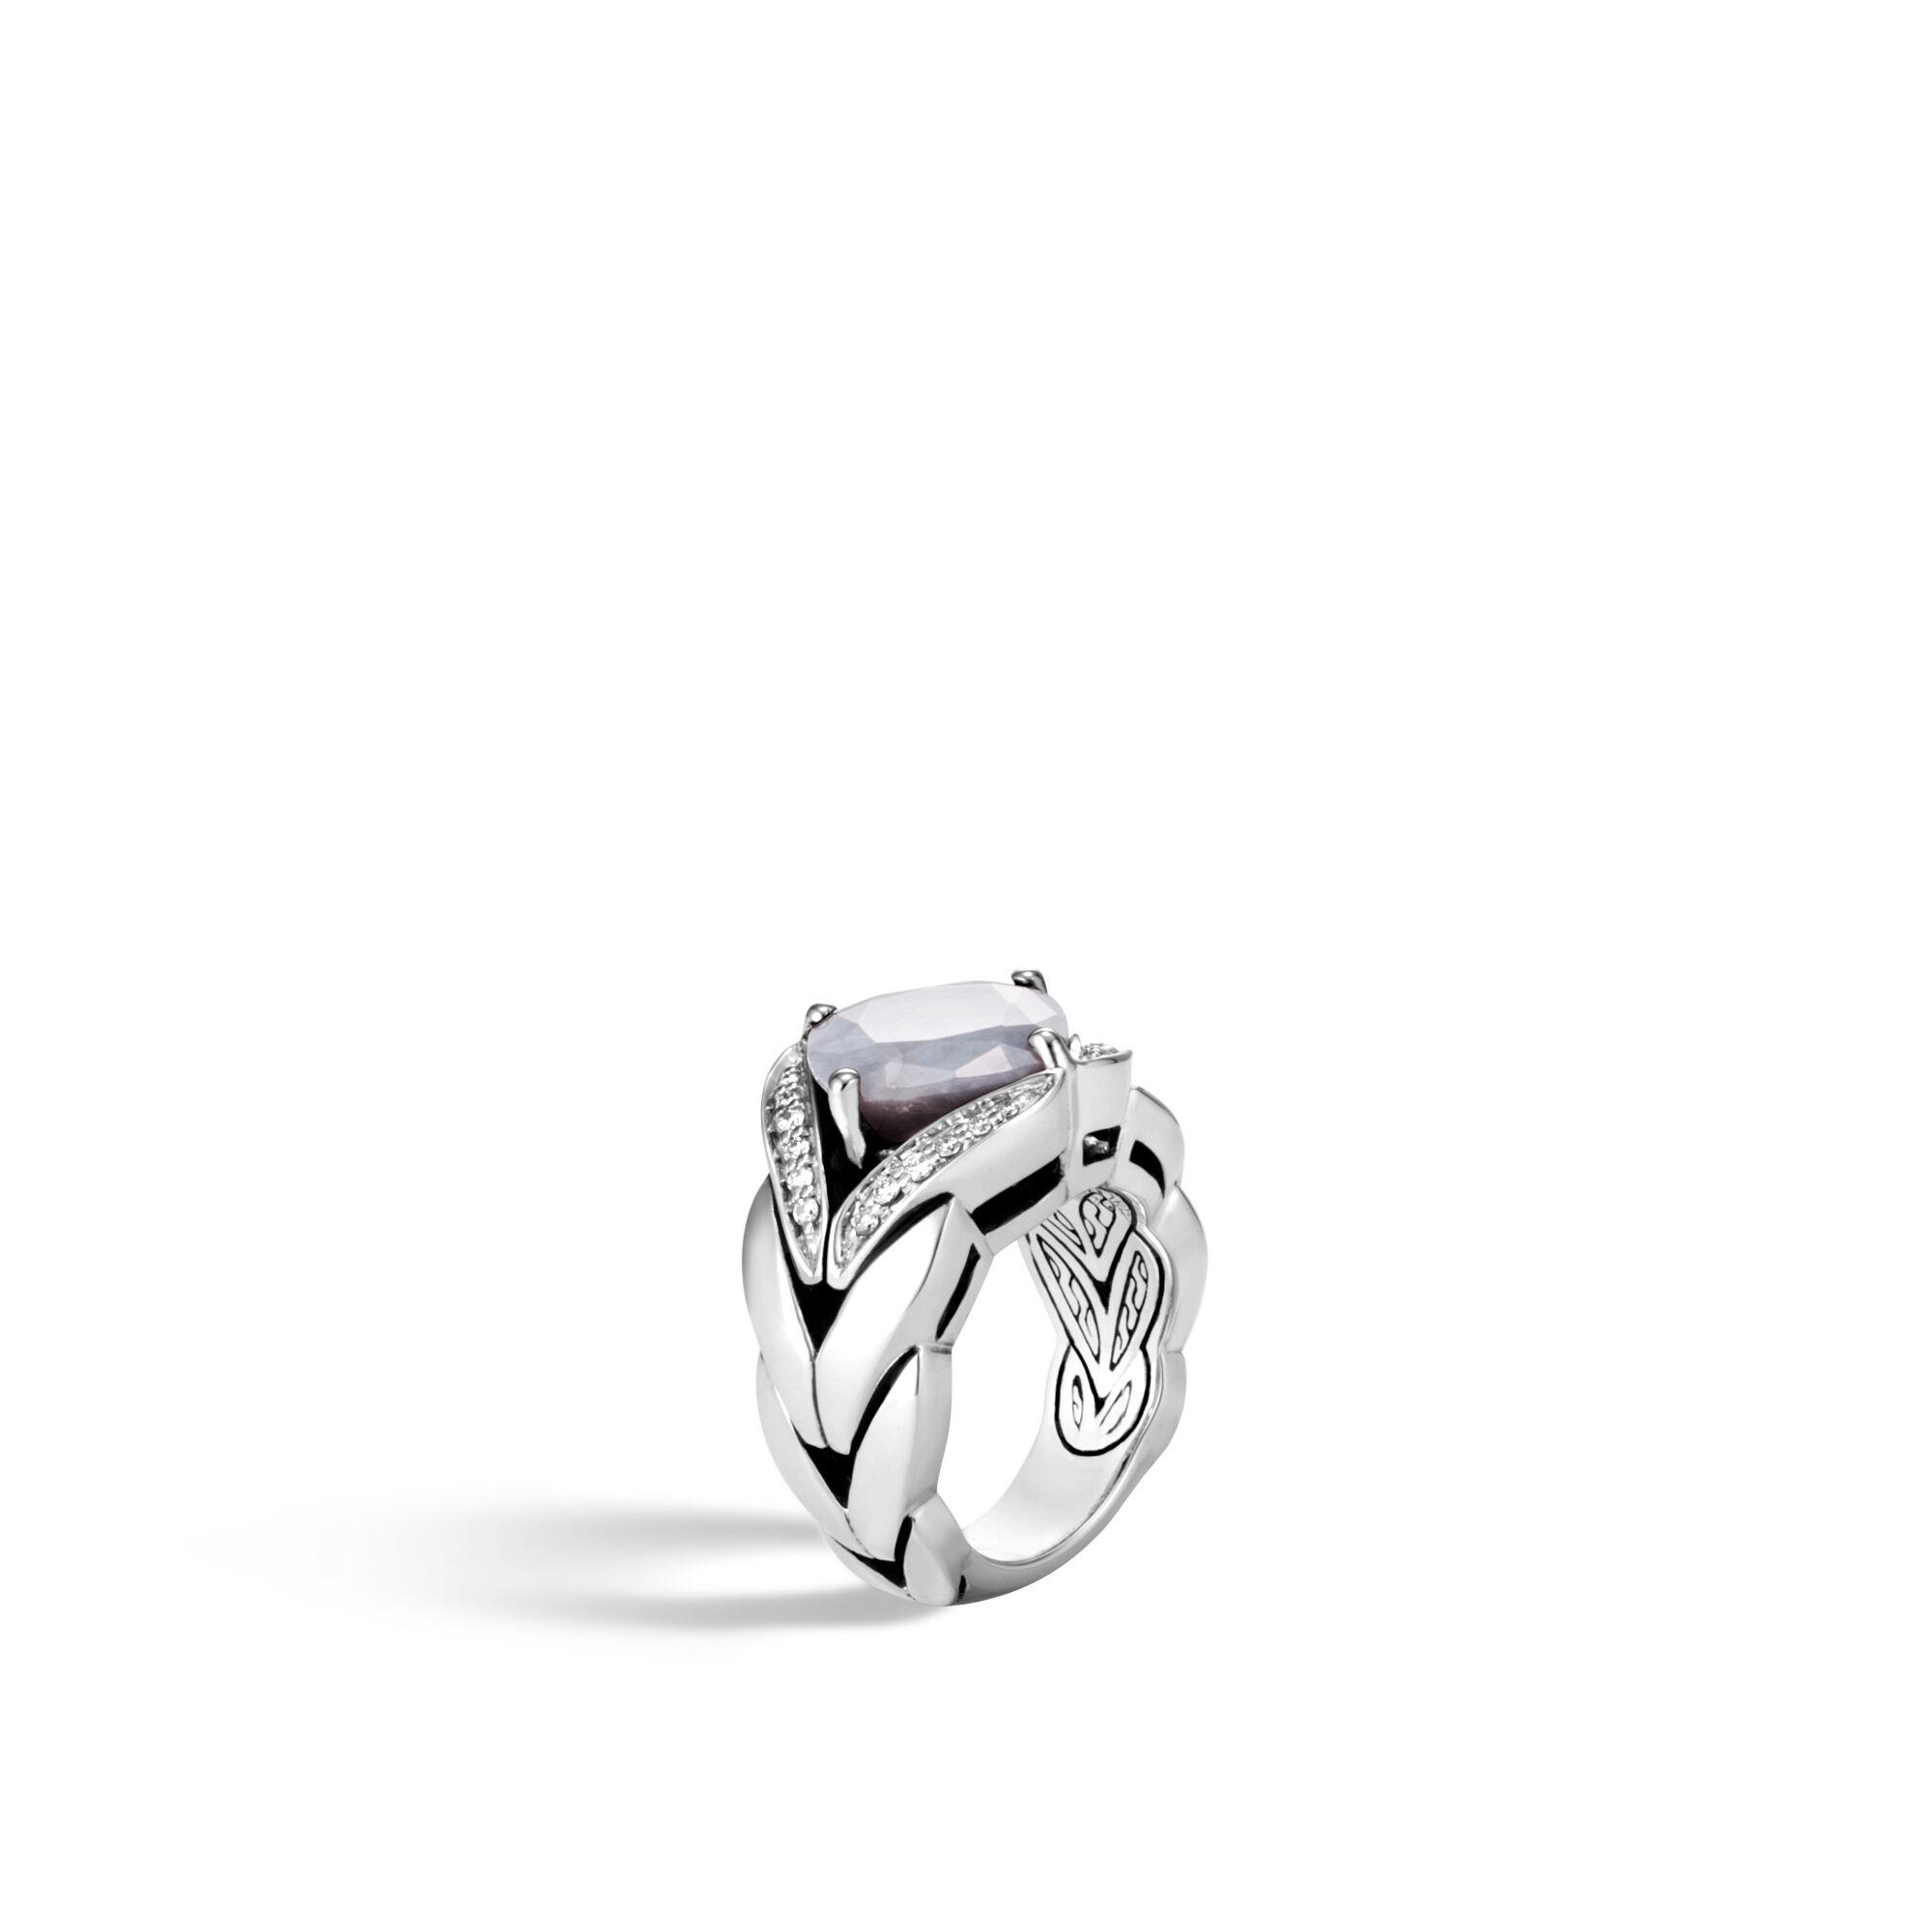 John Hardy Modern Chain Magic-Cut Ring with Diamonds 7OltN3